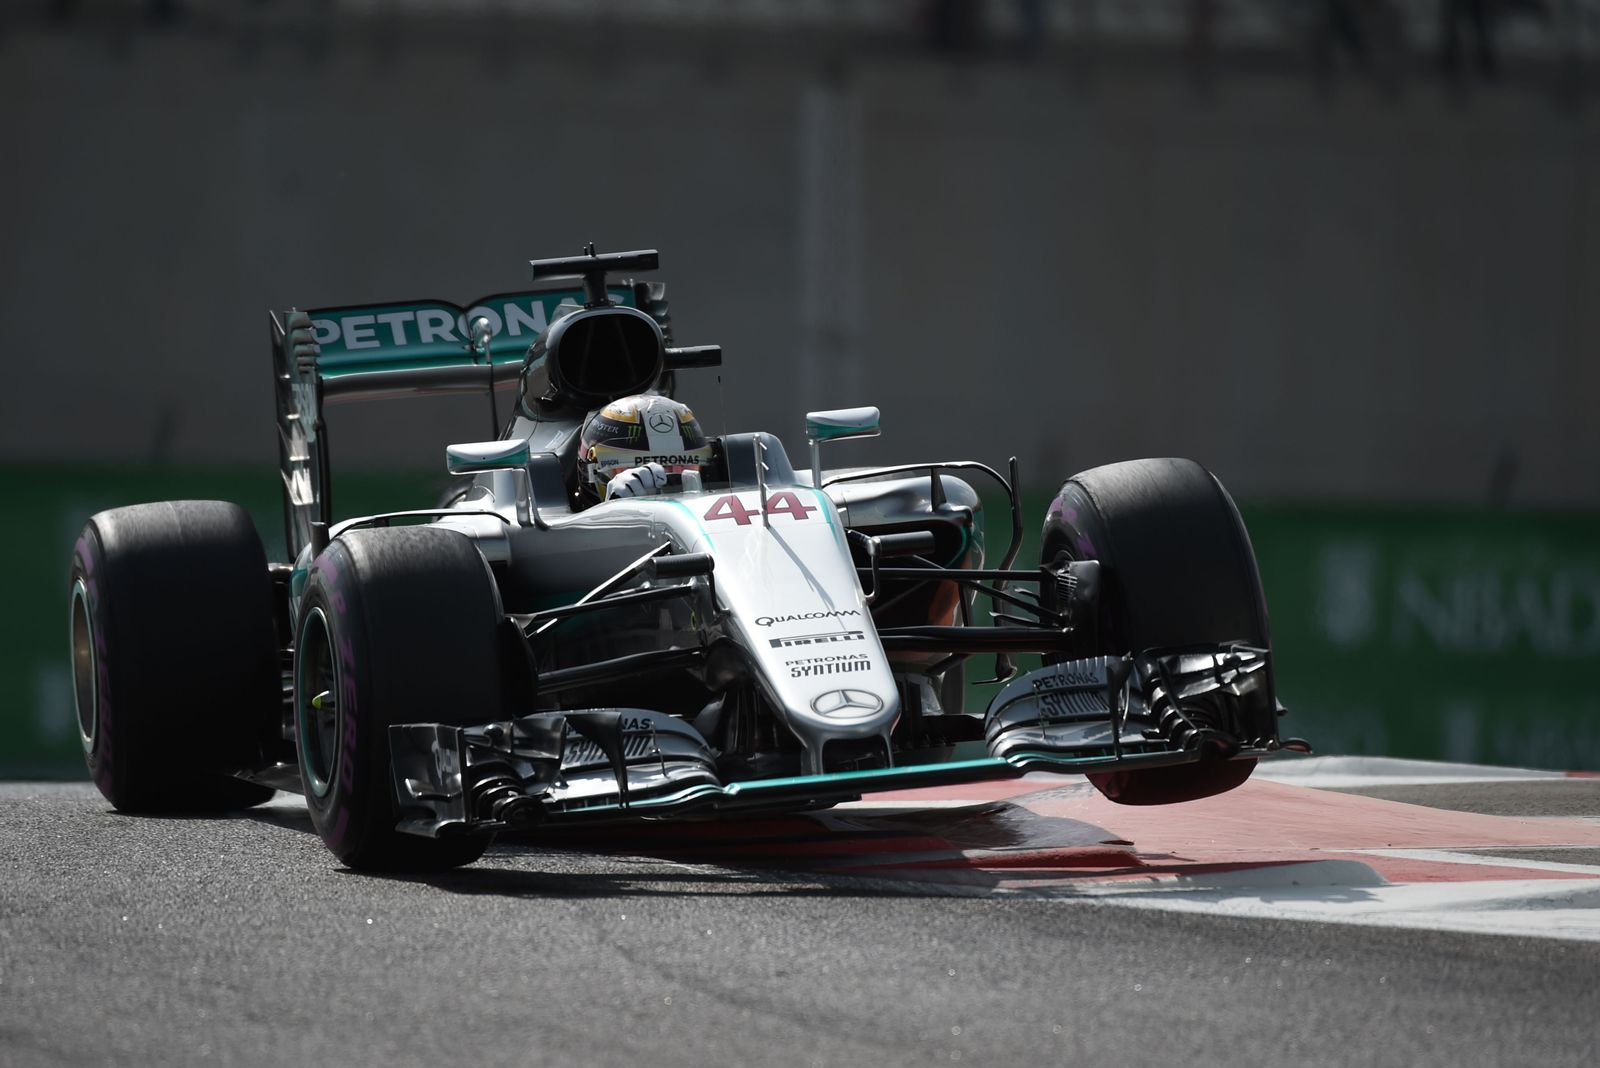 AUTO-PRIX-F1-UAE-PRACTICE